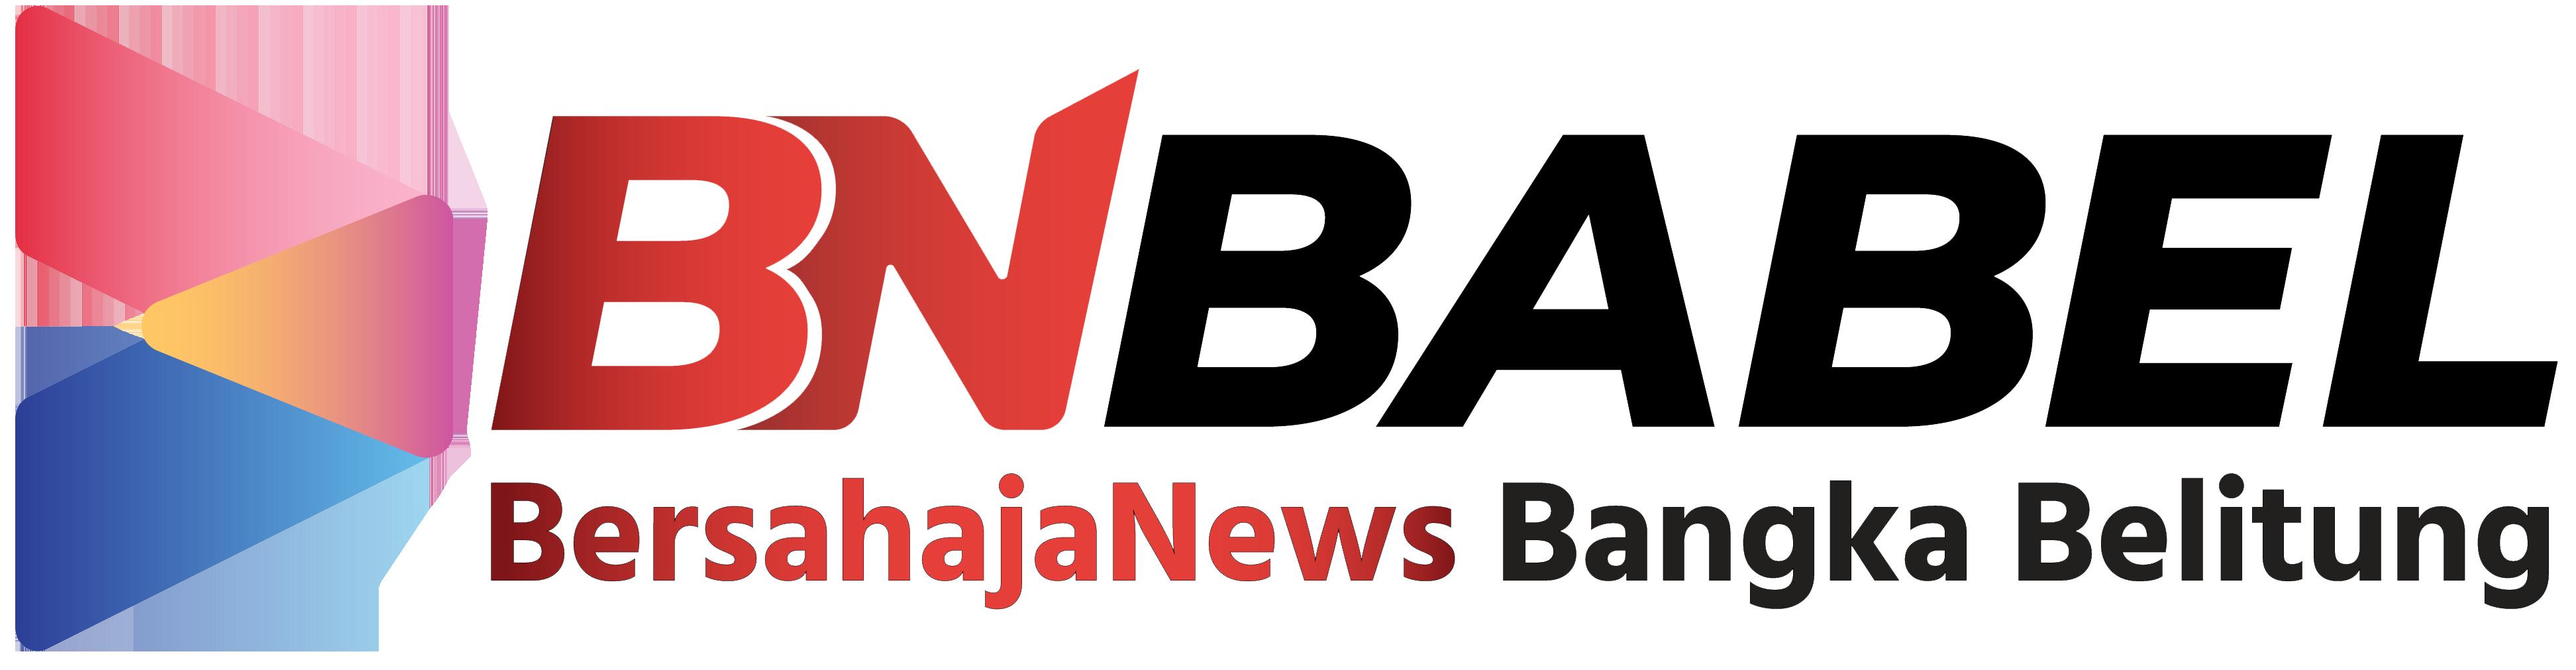 BN Babel